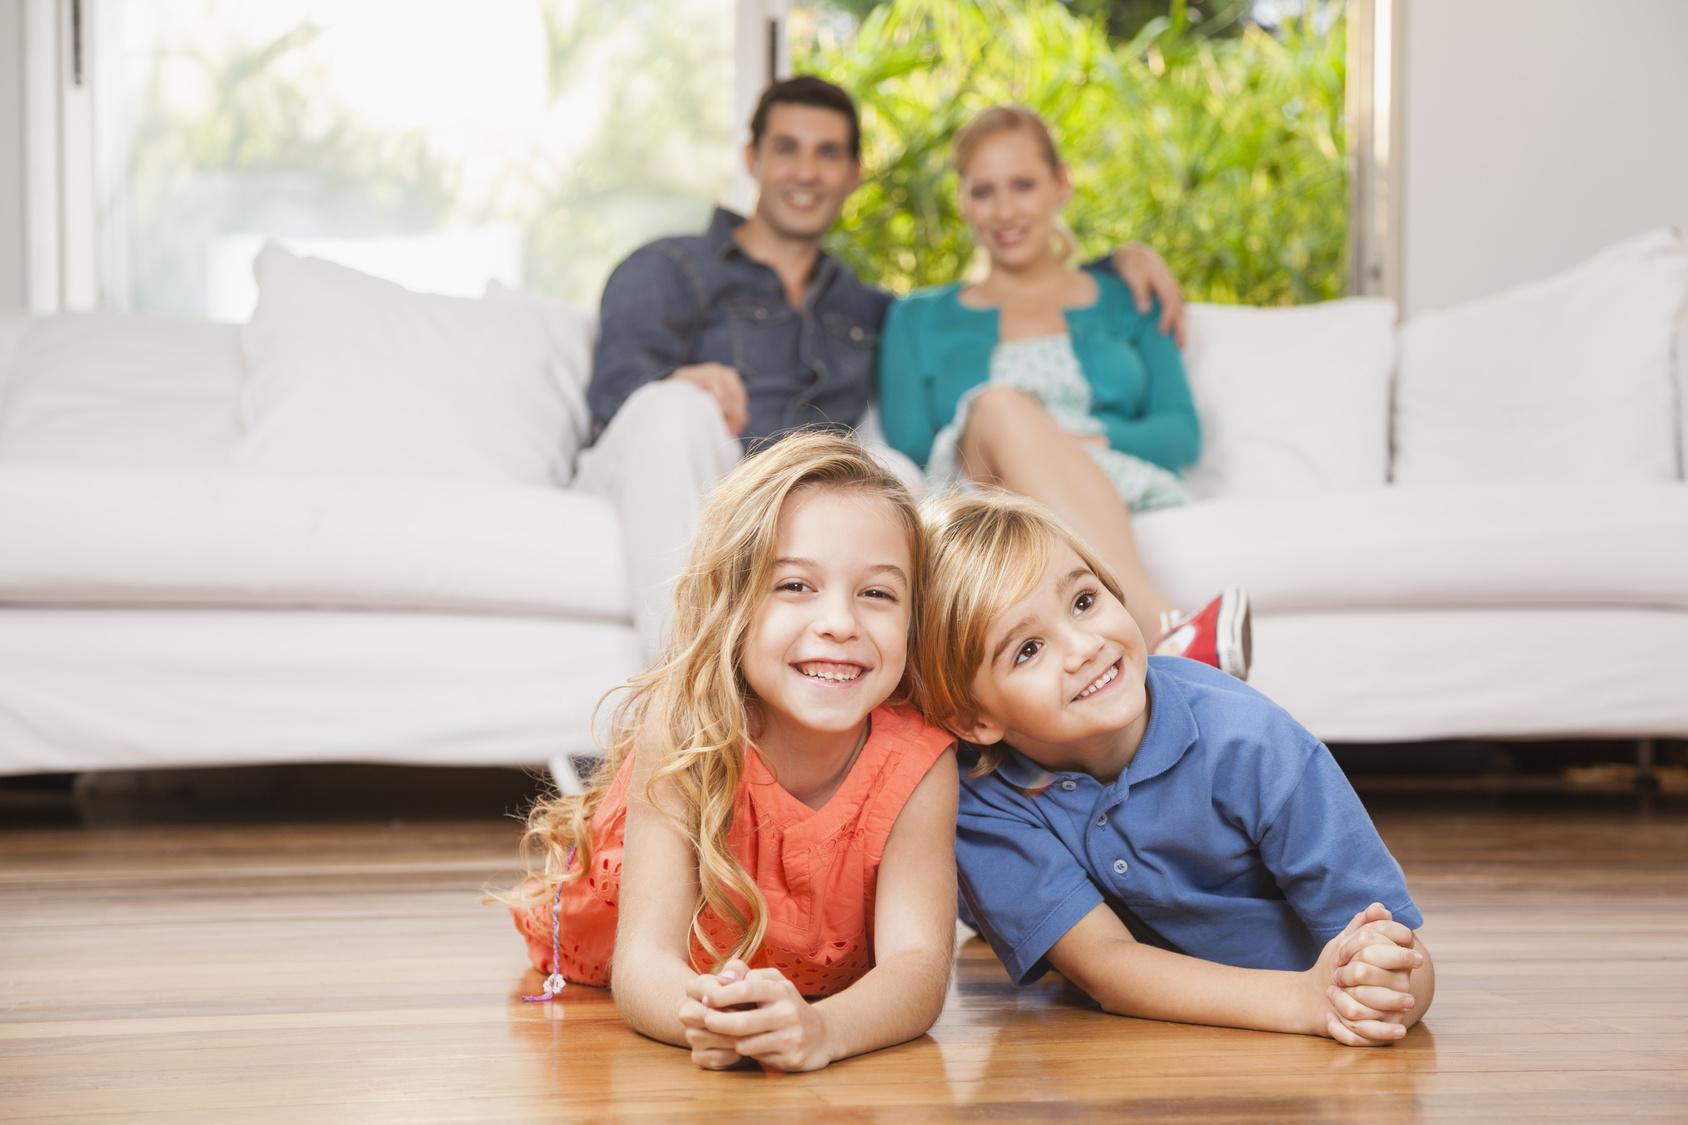 overbruggingskrediet om nieuwe woning te financieren